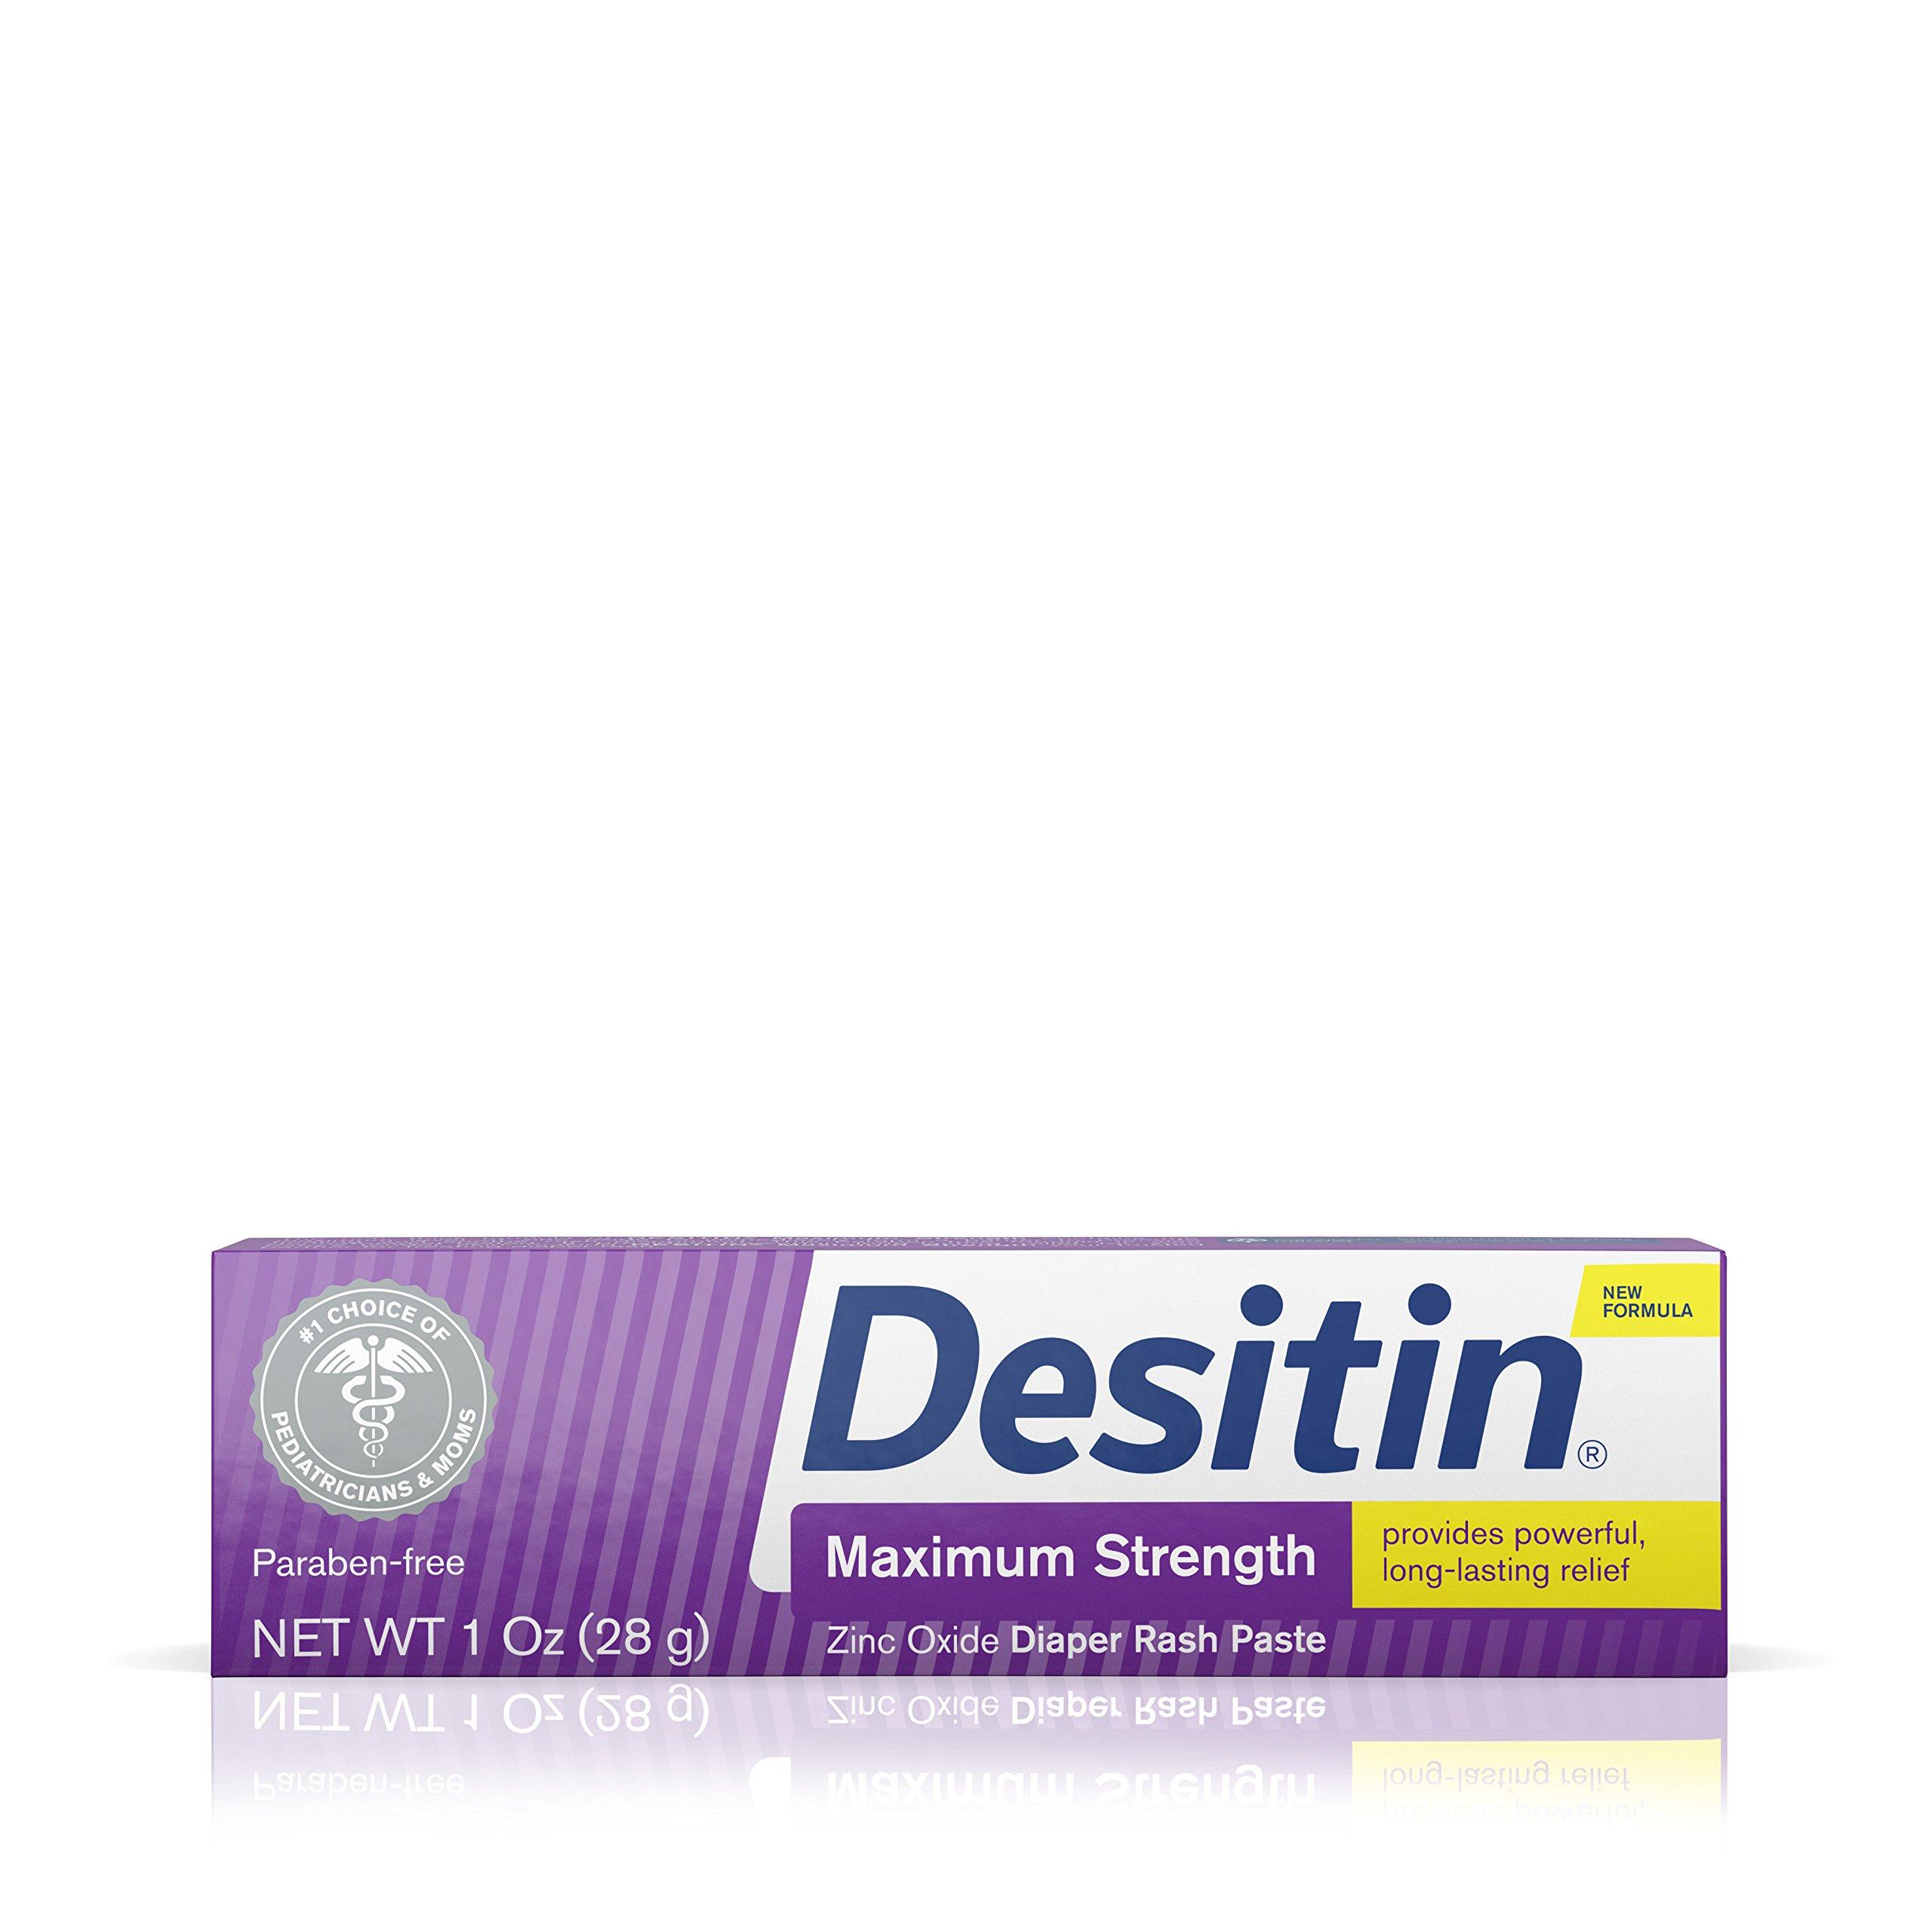 Desitin Diaper Rash Maximum Strength Original Paste, Travel Size, 1 Oz. Tube (Pack of 6) by Desitin (Image #1)